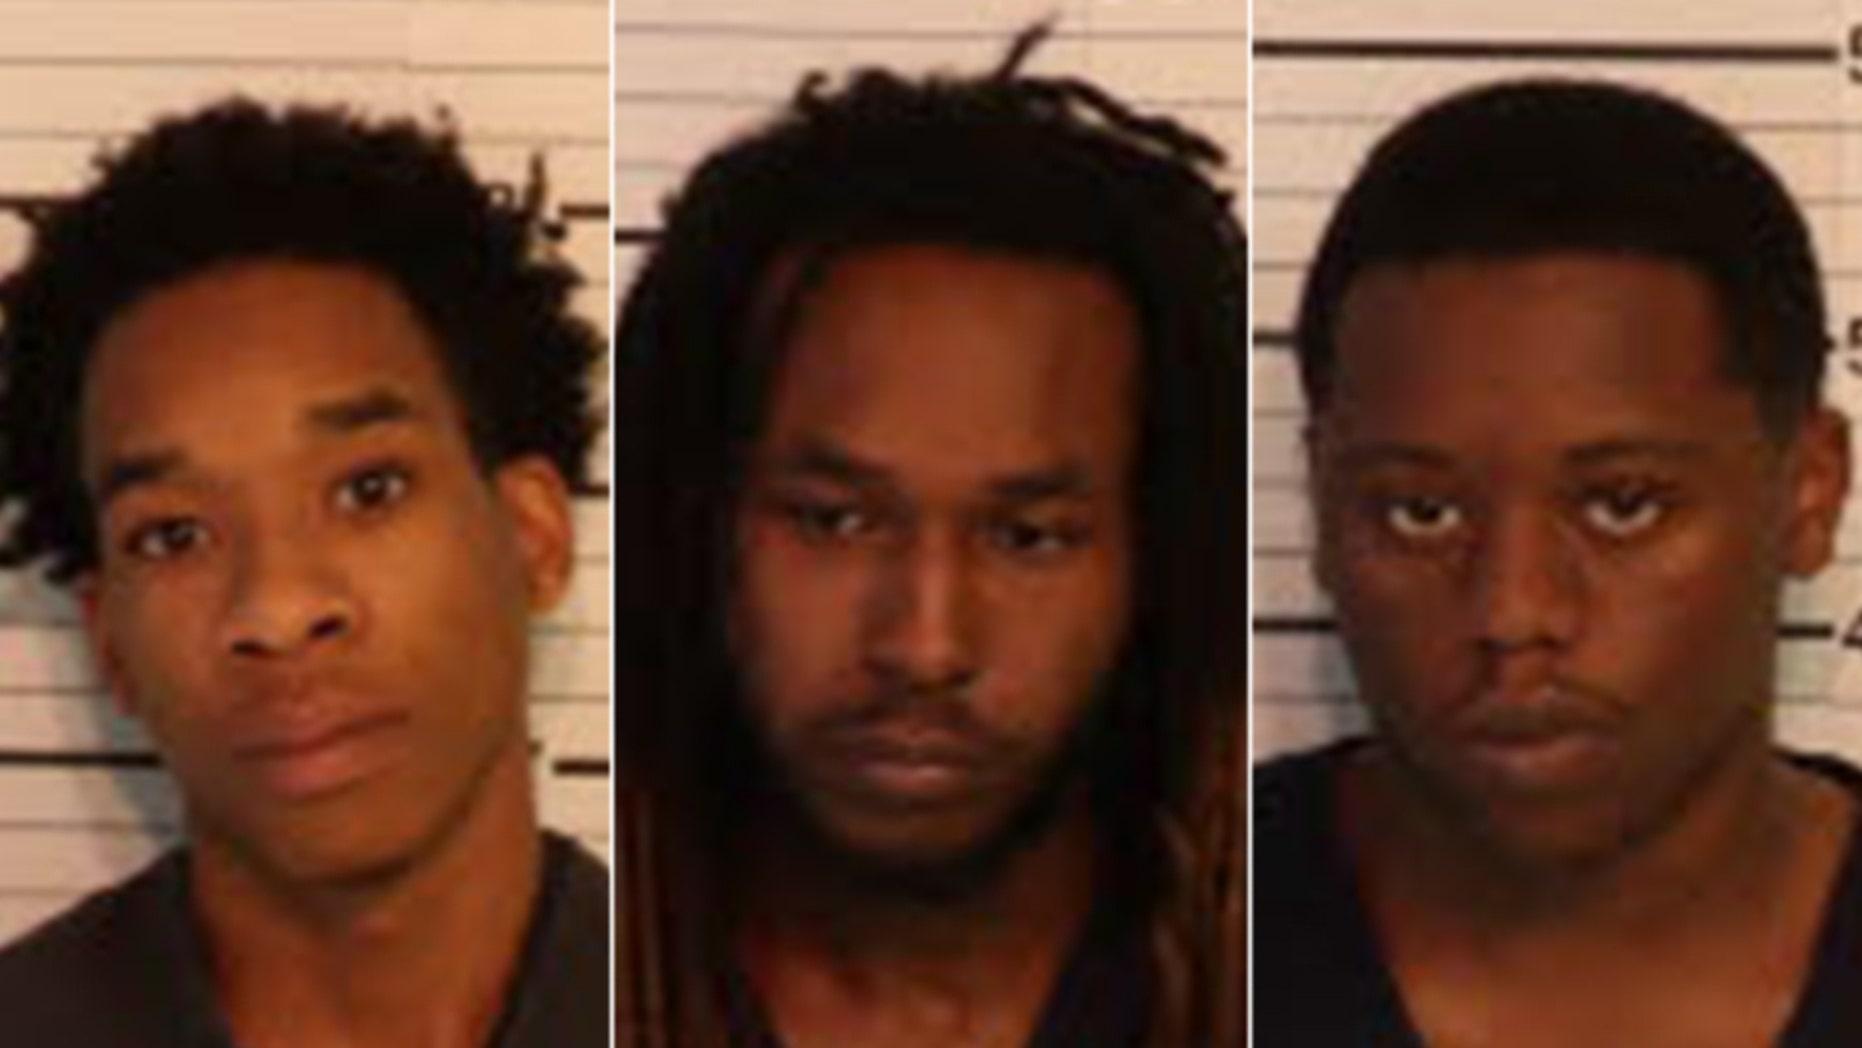 Mugshots for Carlos Craft, 21, Demetrius Harris, 23, and Marcus Brown, 19.